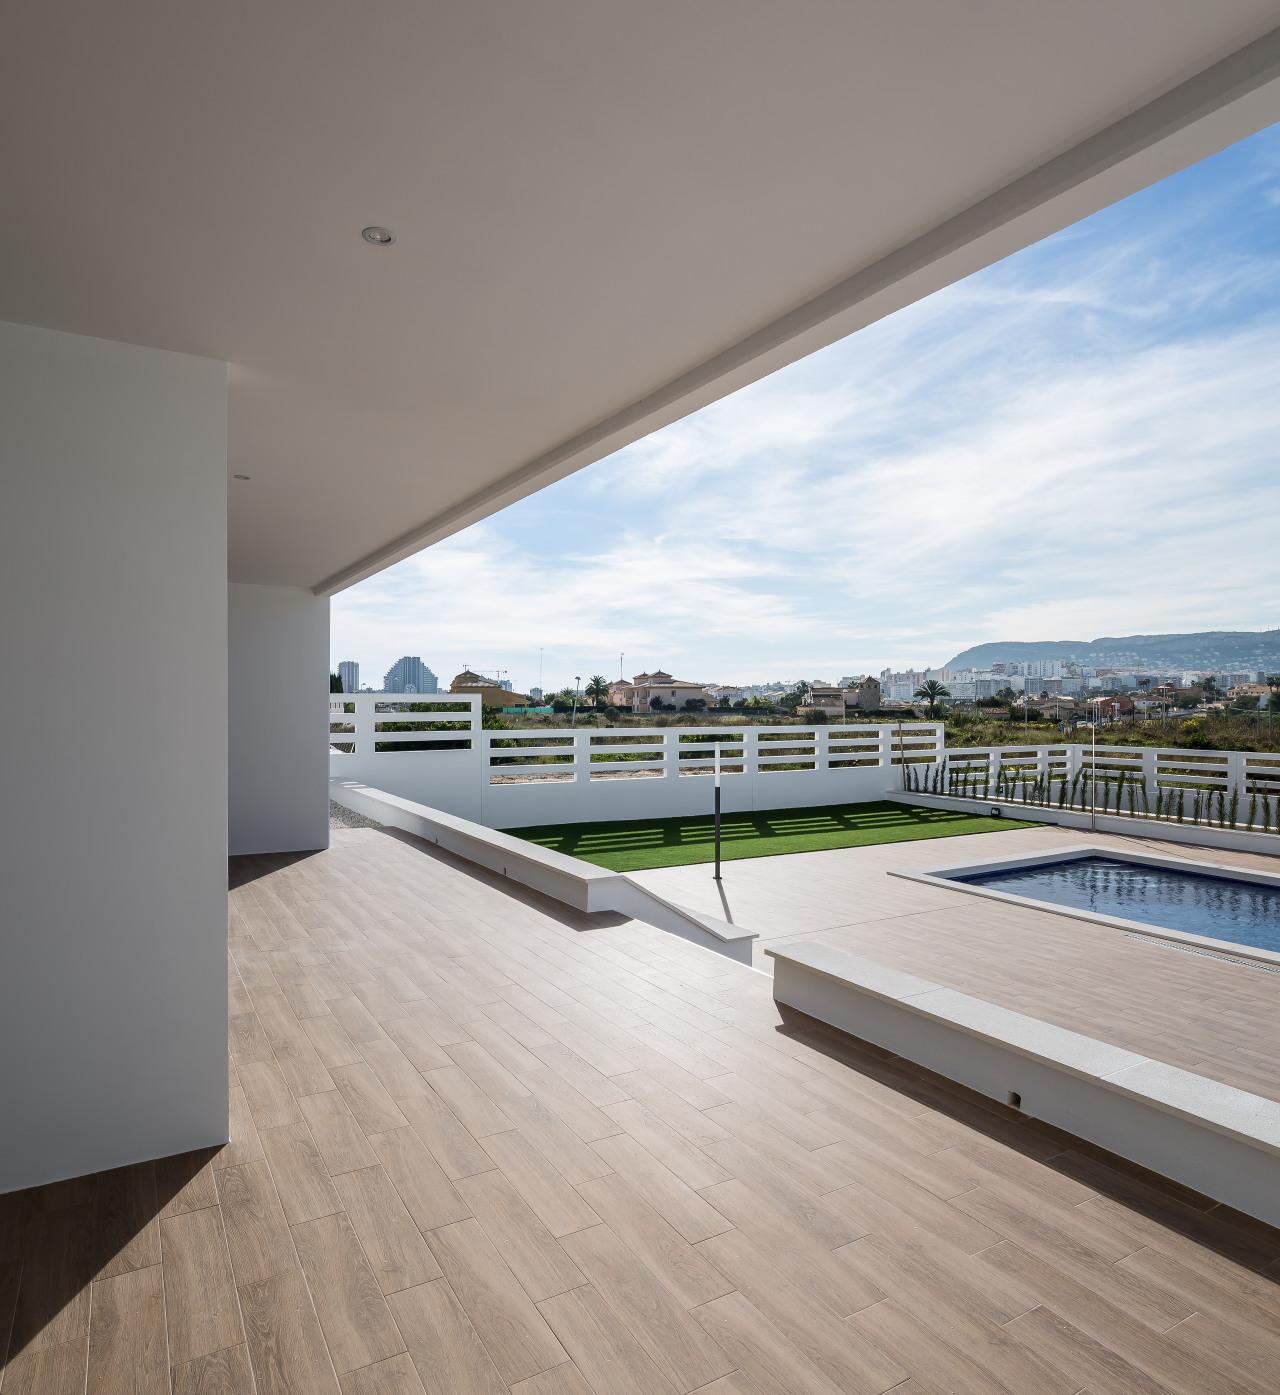 fotografia-arquitectura-valencia-german-cabo-viraje-vivienda-unifamiliar-calpe (25)